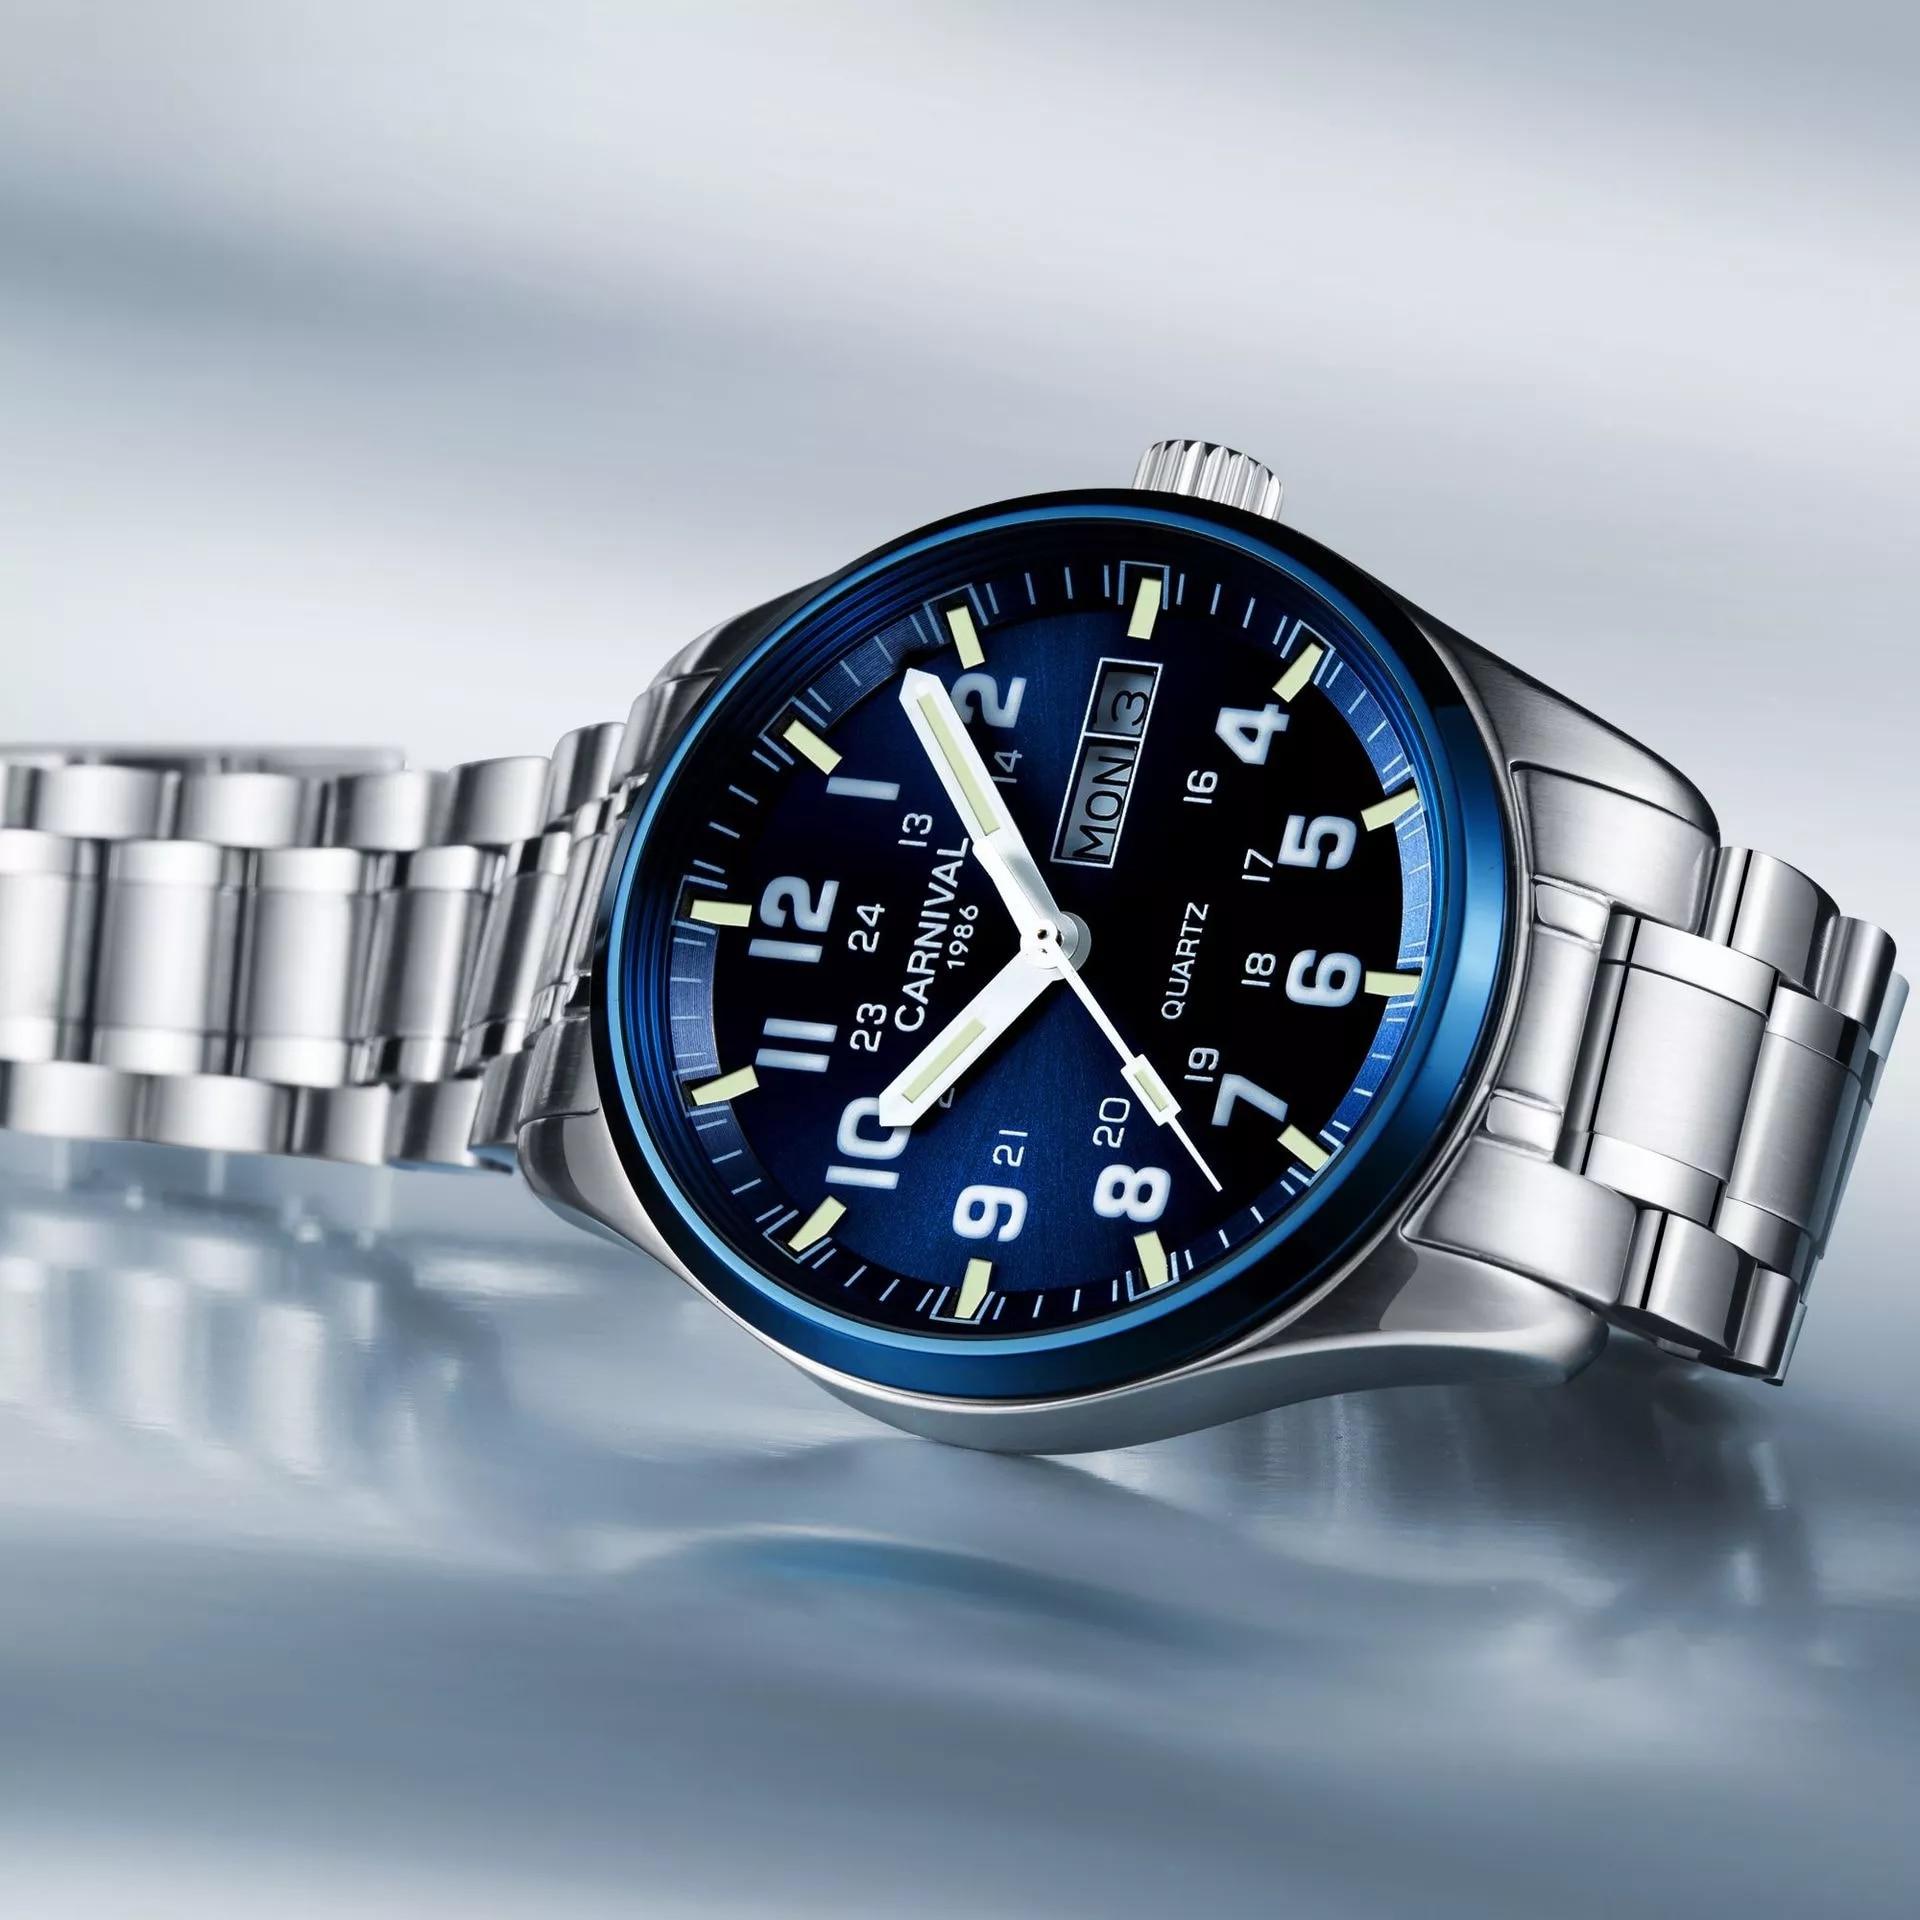 Carnival watches men Switzerland luxury brand moon phase automatic mechanical watch full steel multifunction waterproof 2020